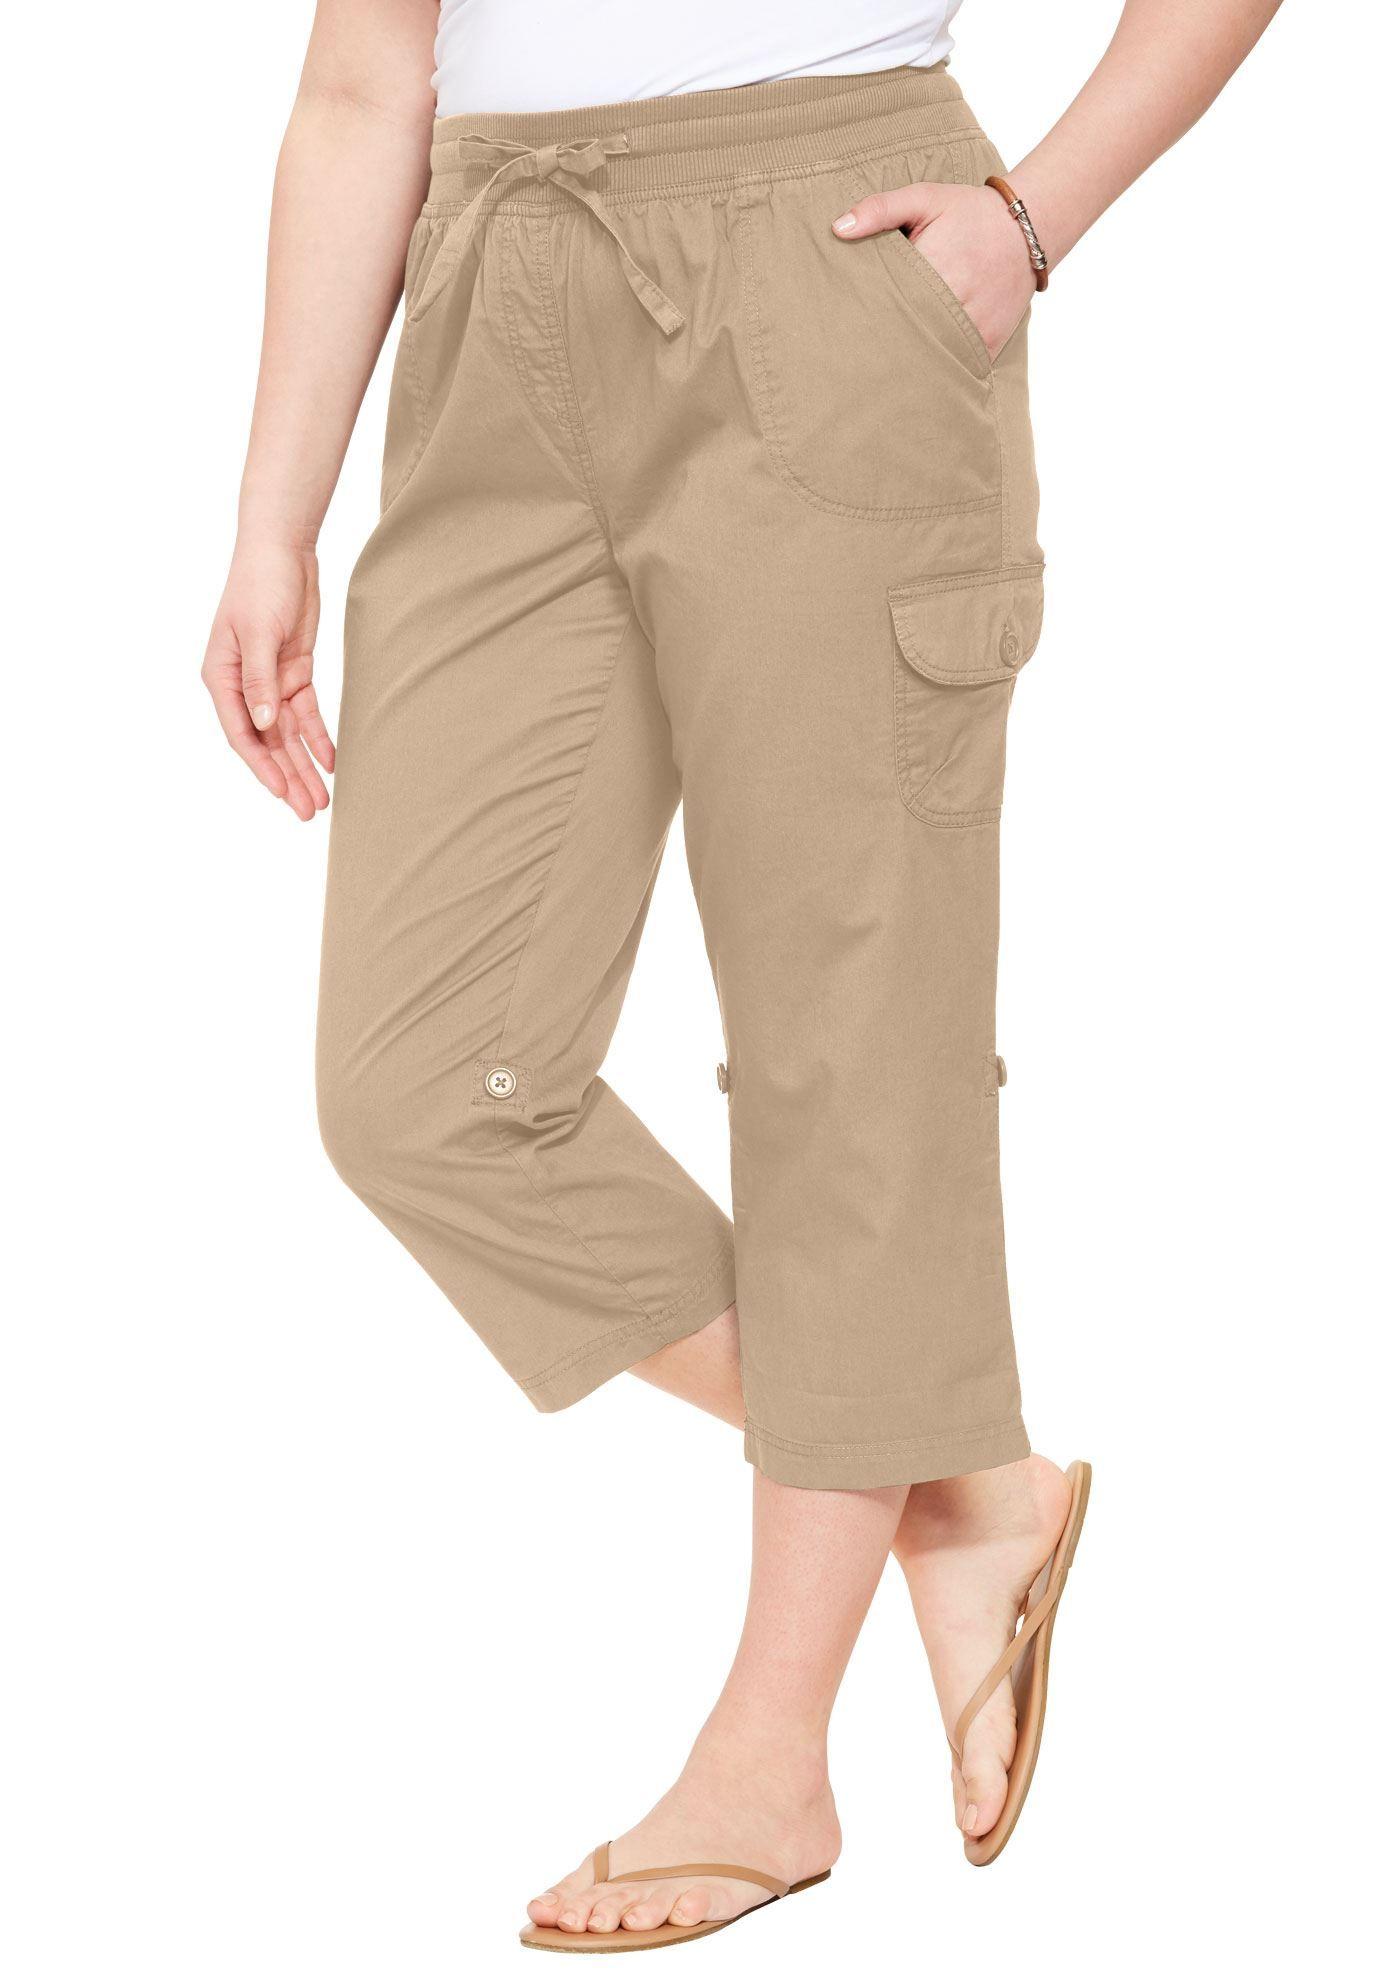 Pants, Capri Style in Convertible Lengths - Women\'s Plus ...